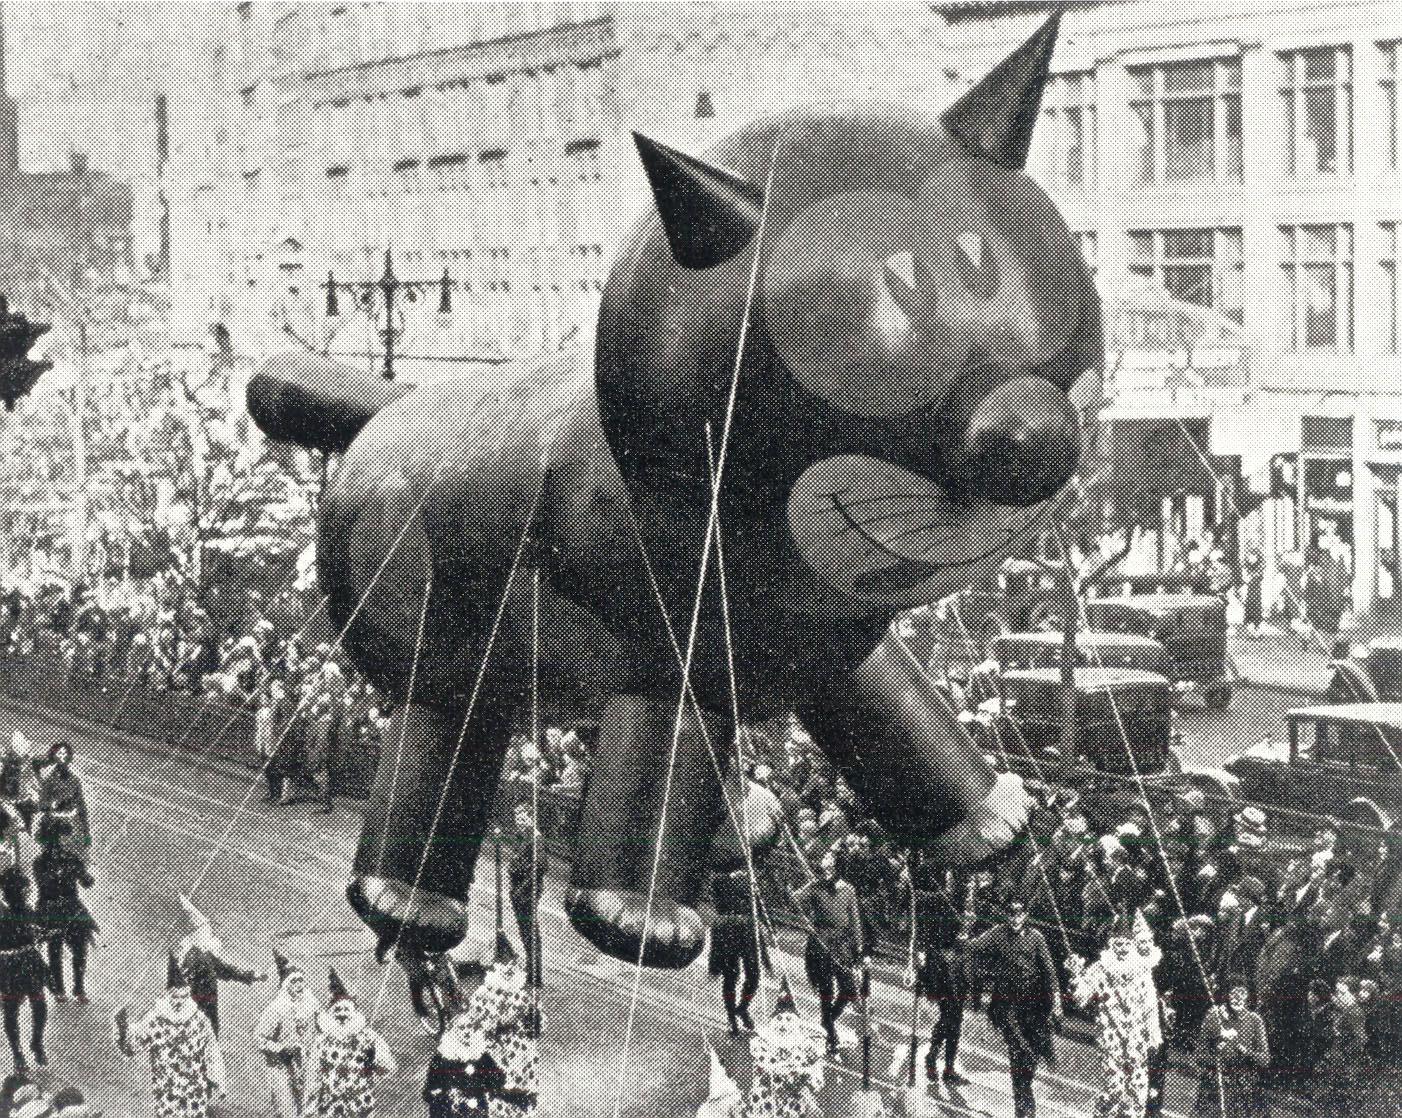 1927-Macys-Thanksgiving-Day-Parade-Felix-the-Cat.jpg